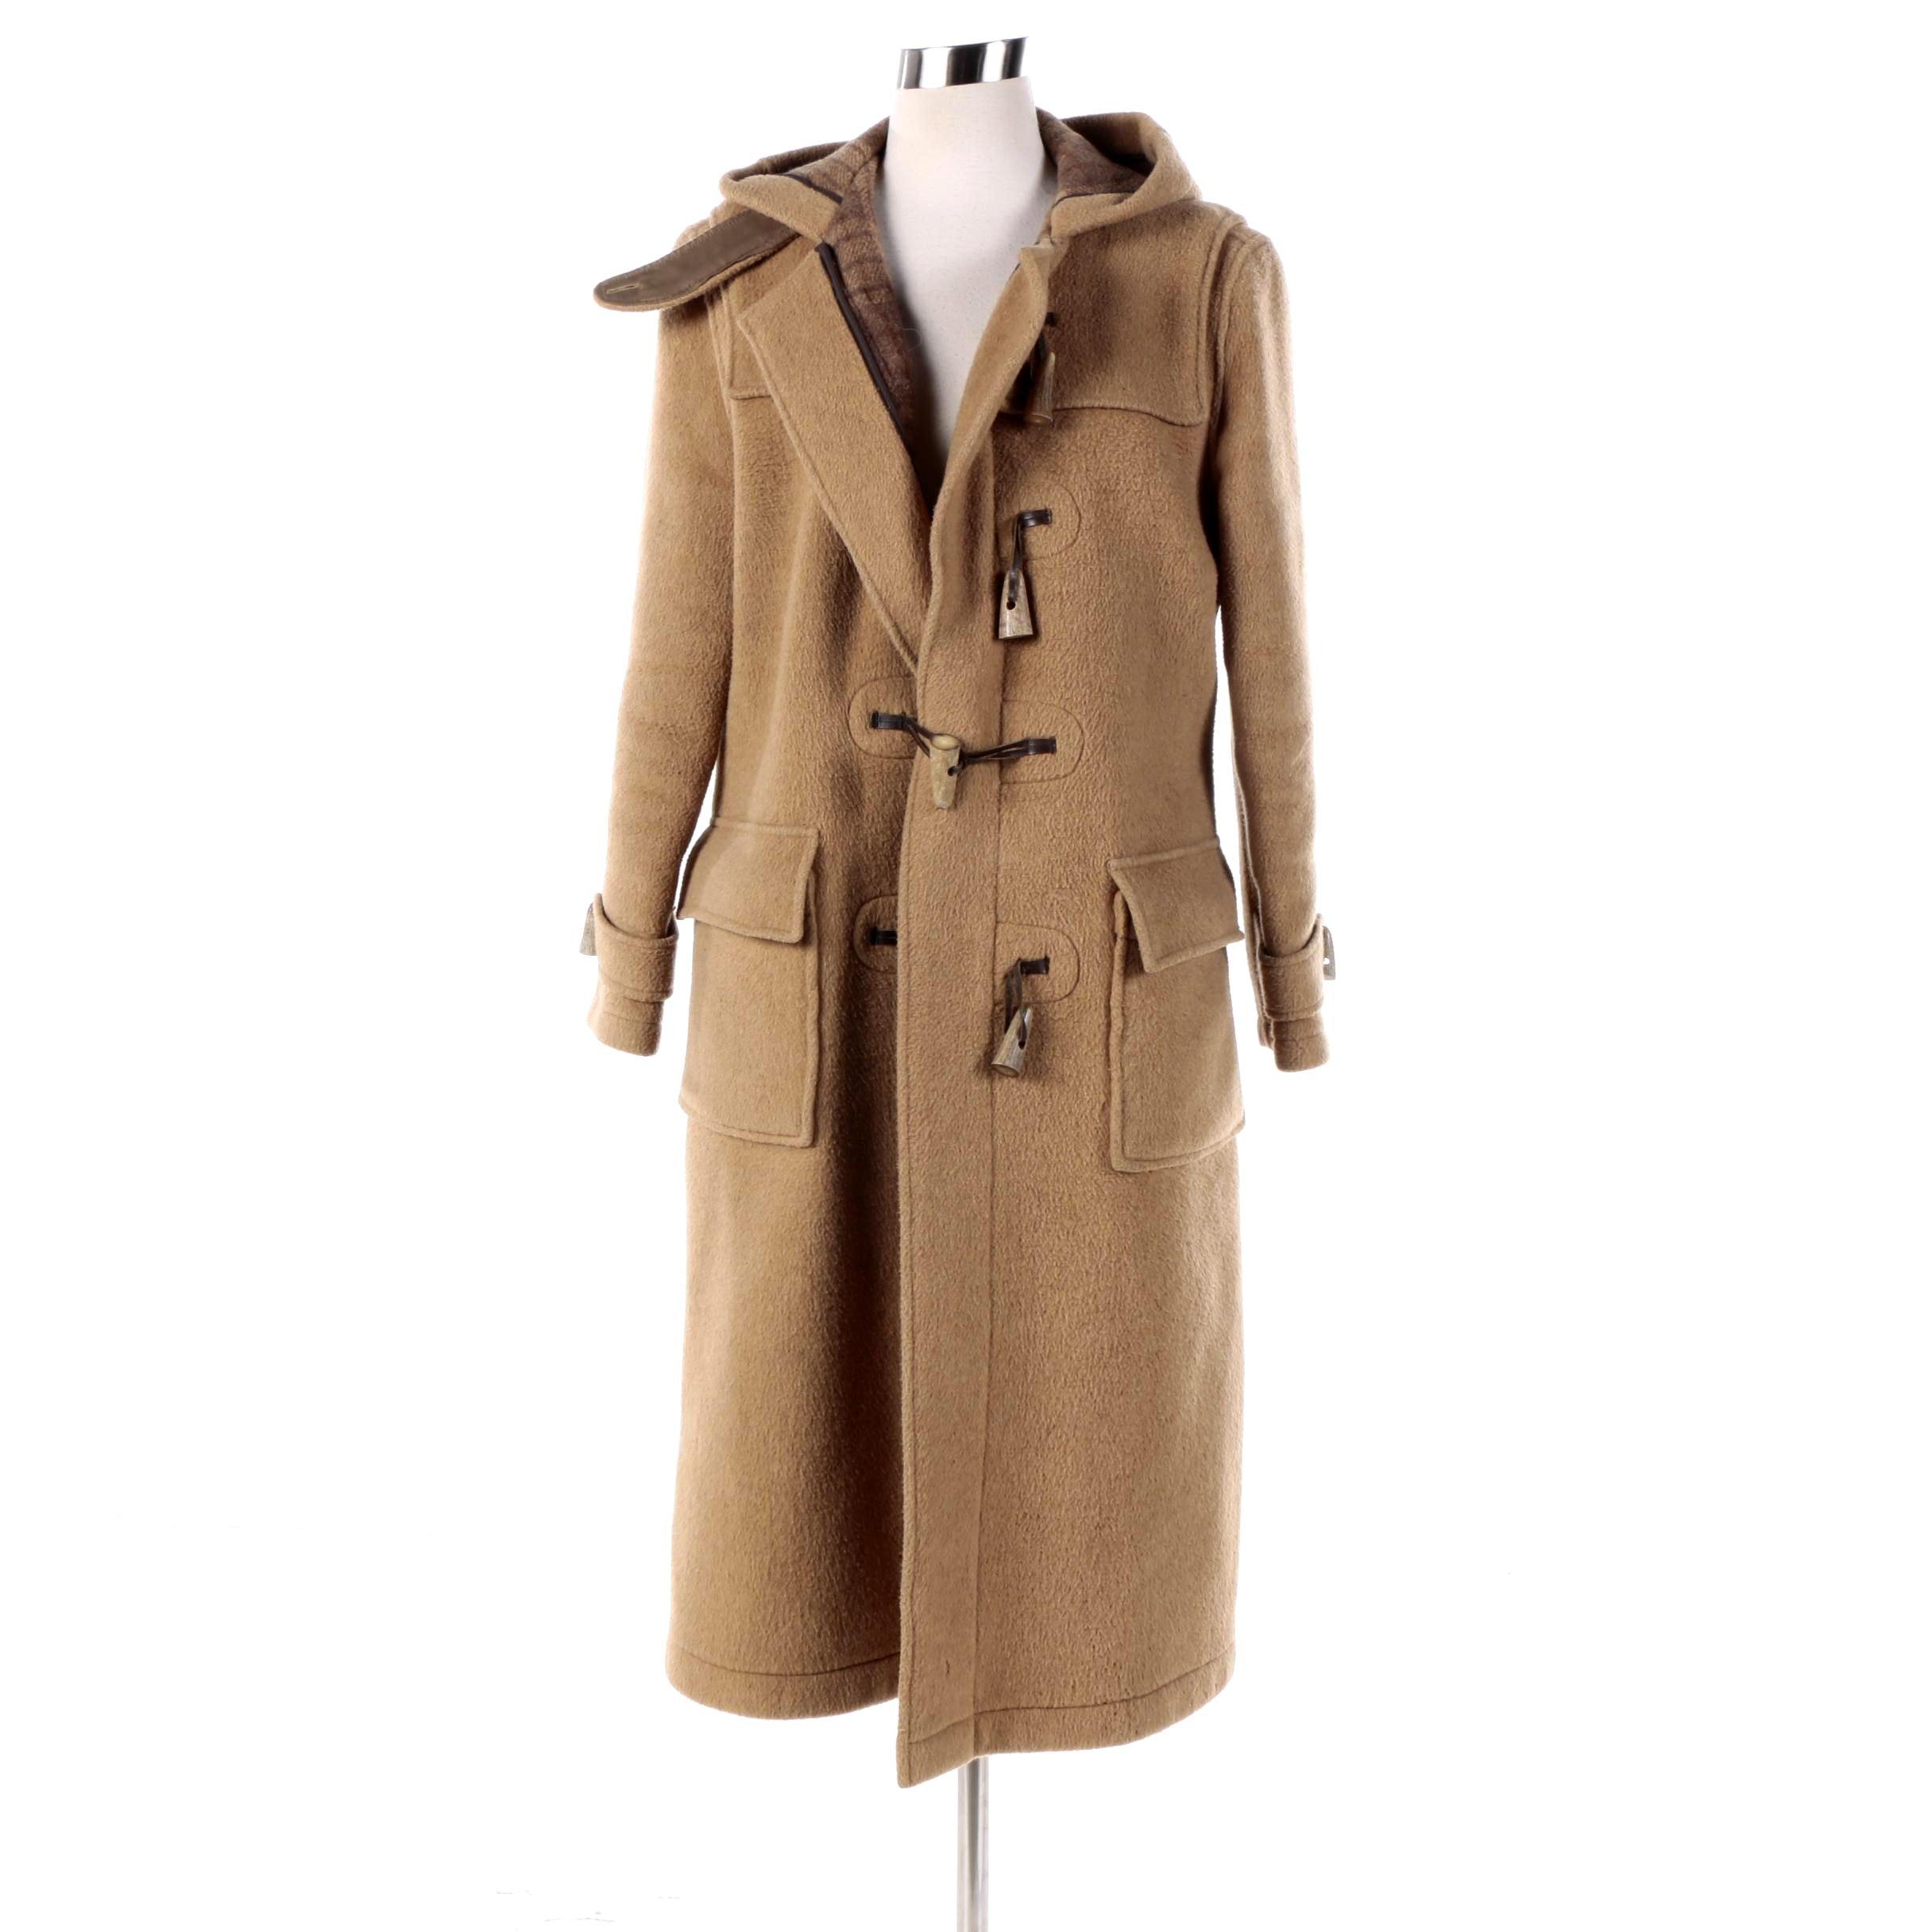 Women's Vintage Tibbett of England Tan Wool Toggle Coat